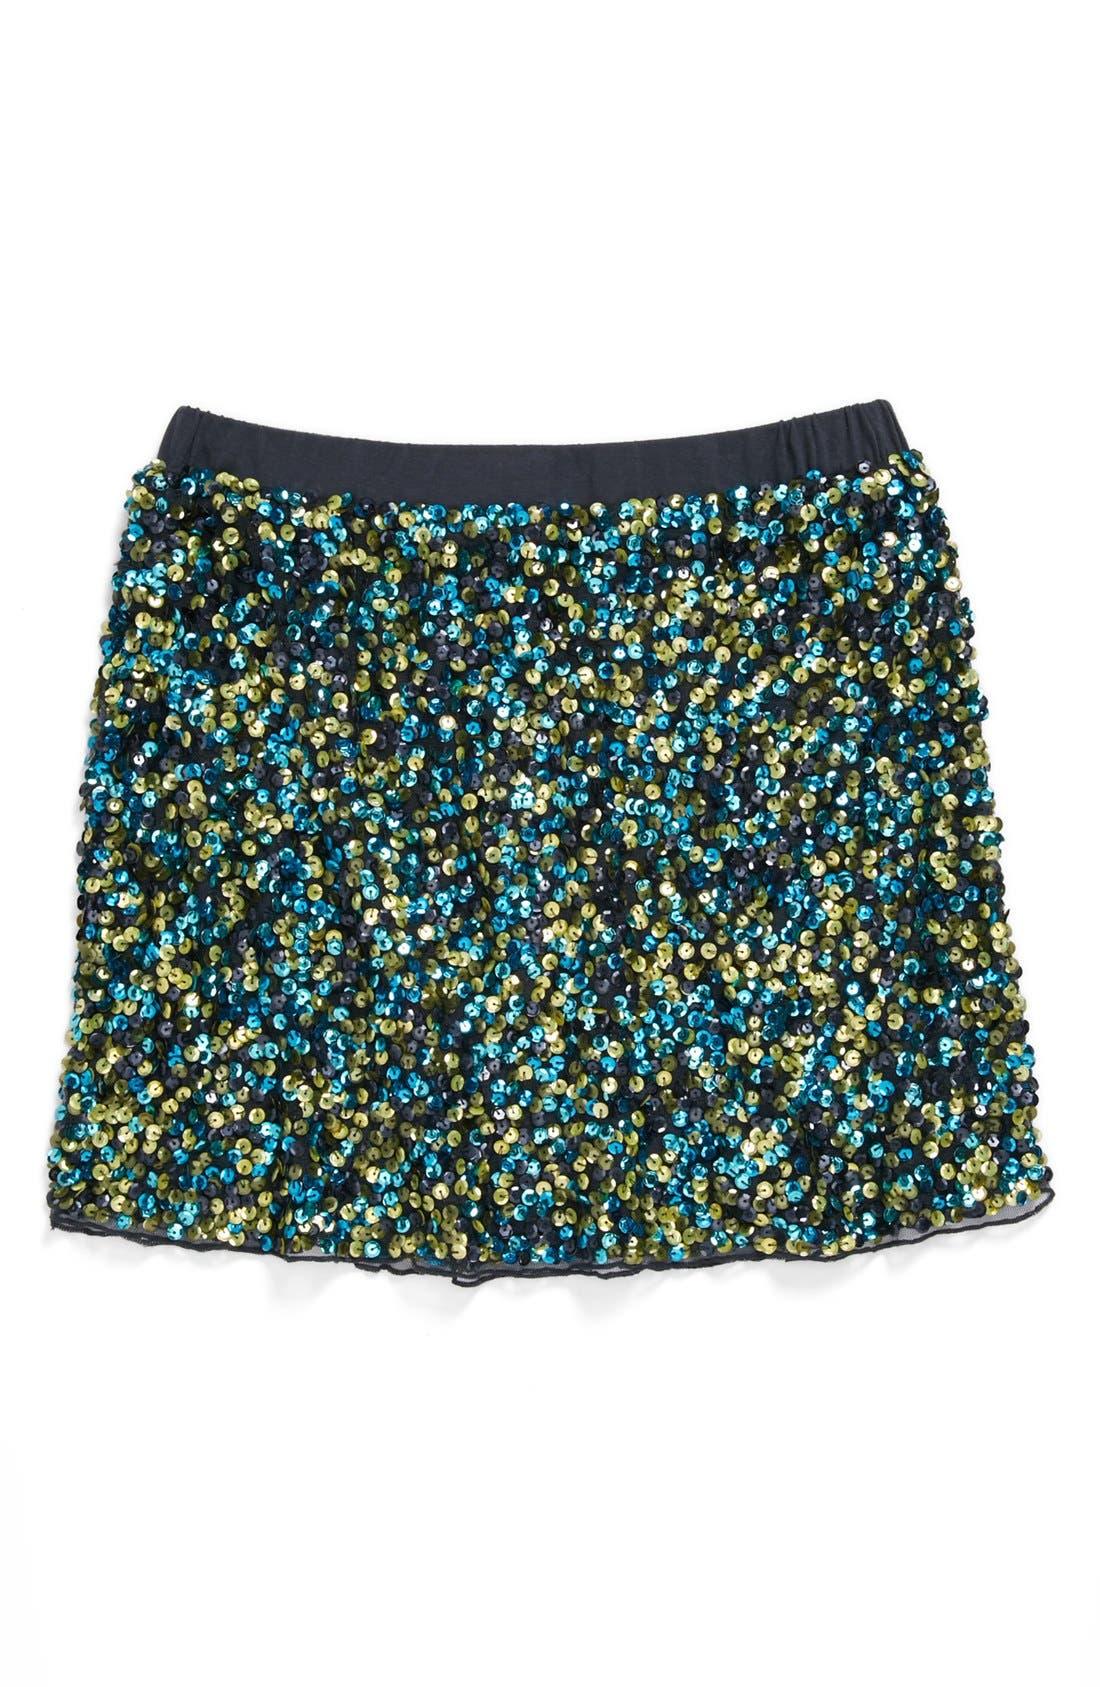 Main Image - Peek 'Zoe' Sequin Skirt (Toddler Girls, Little Girls & Big Girls)